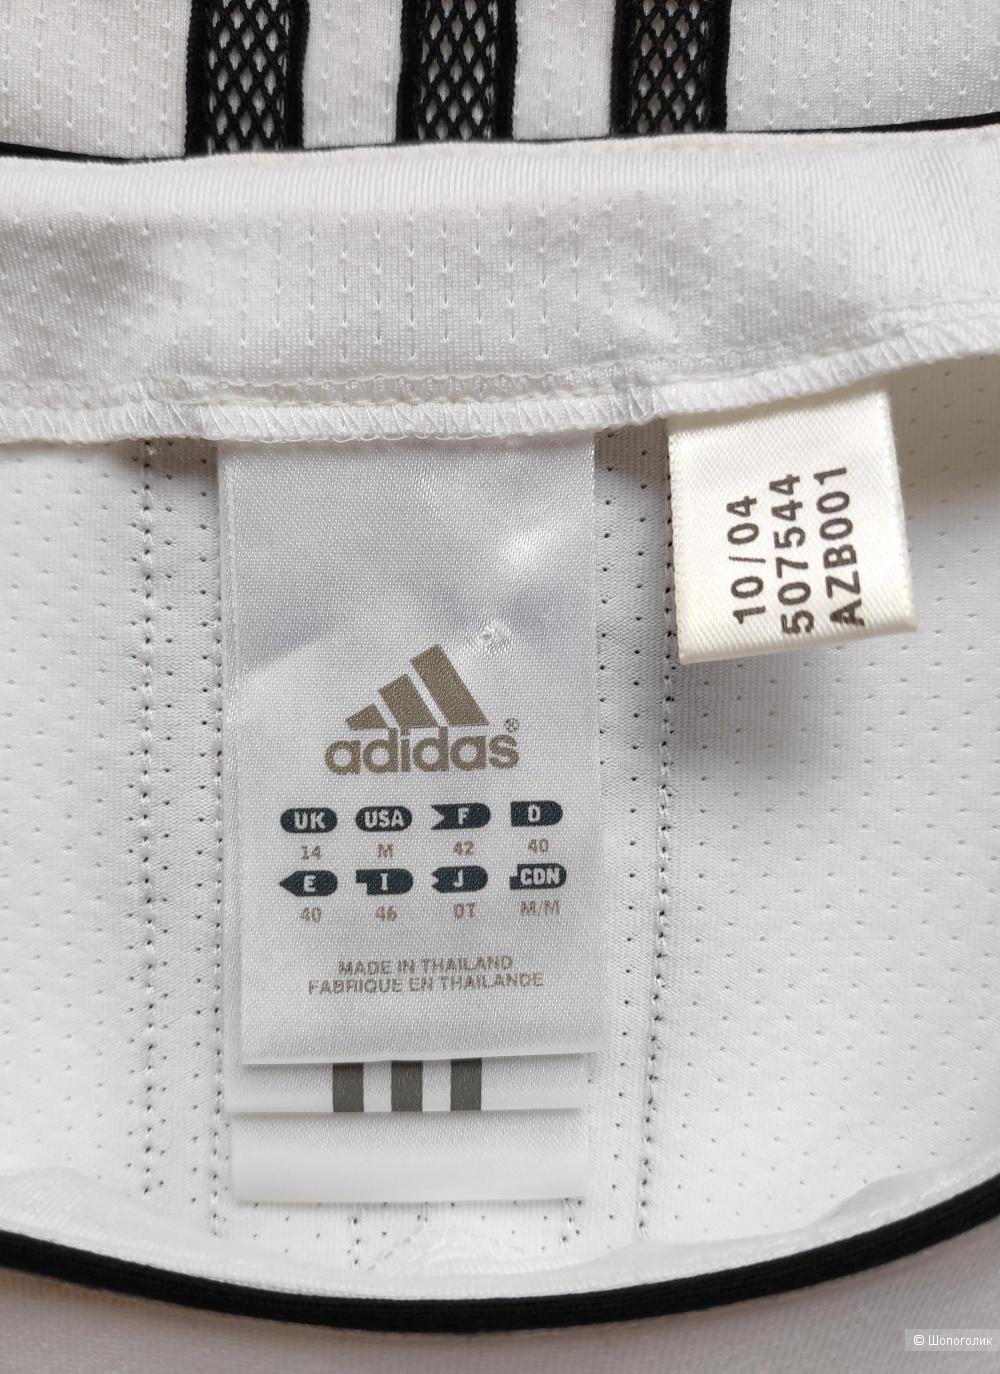 Спортивная майка Adidas, маркировка 40EUR/ 46IT/ 14UK/ M.